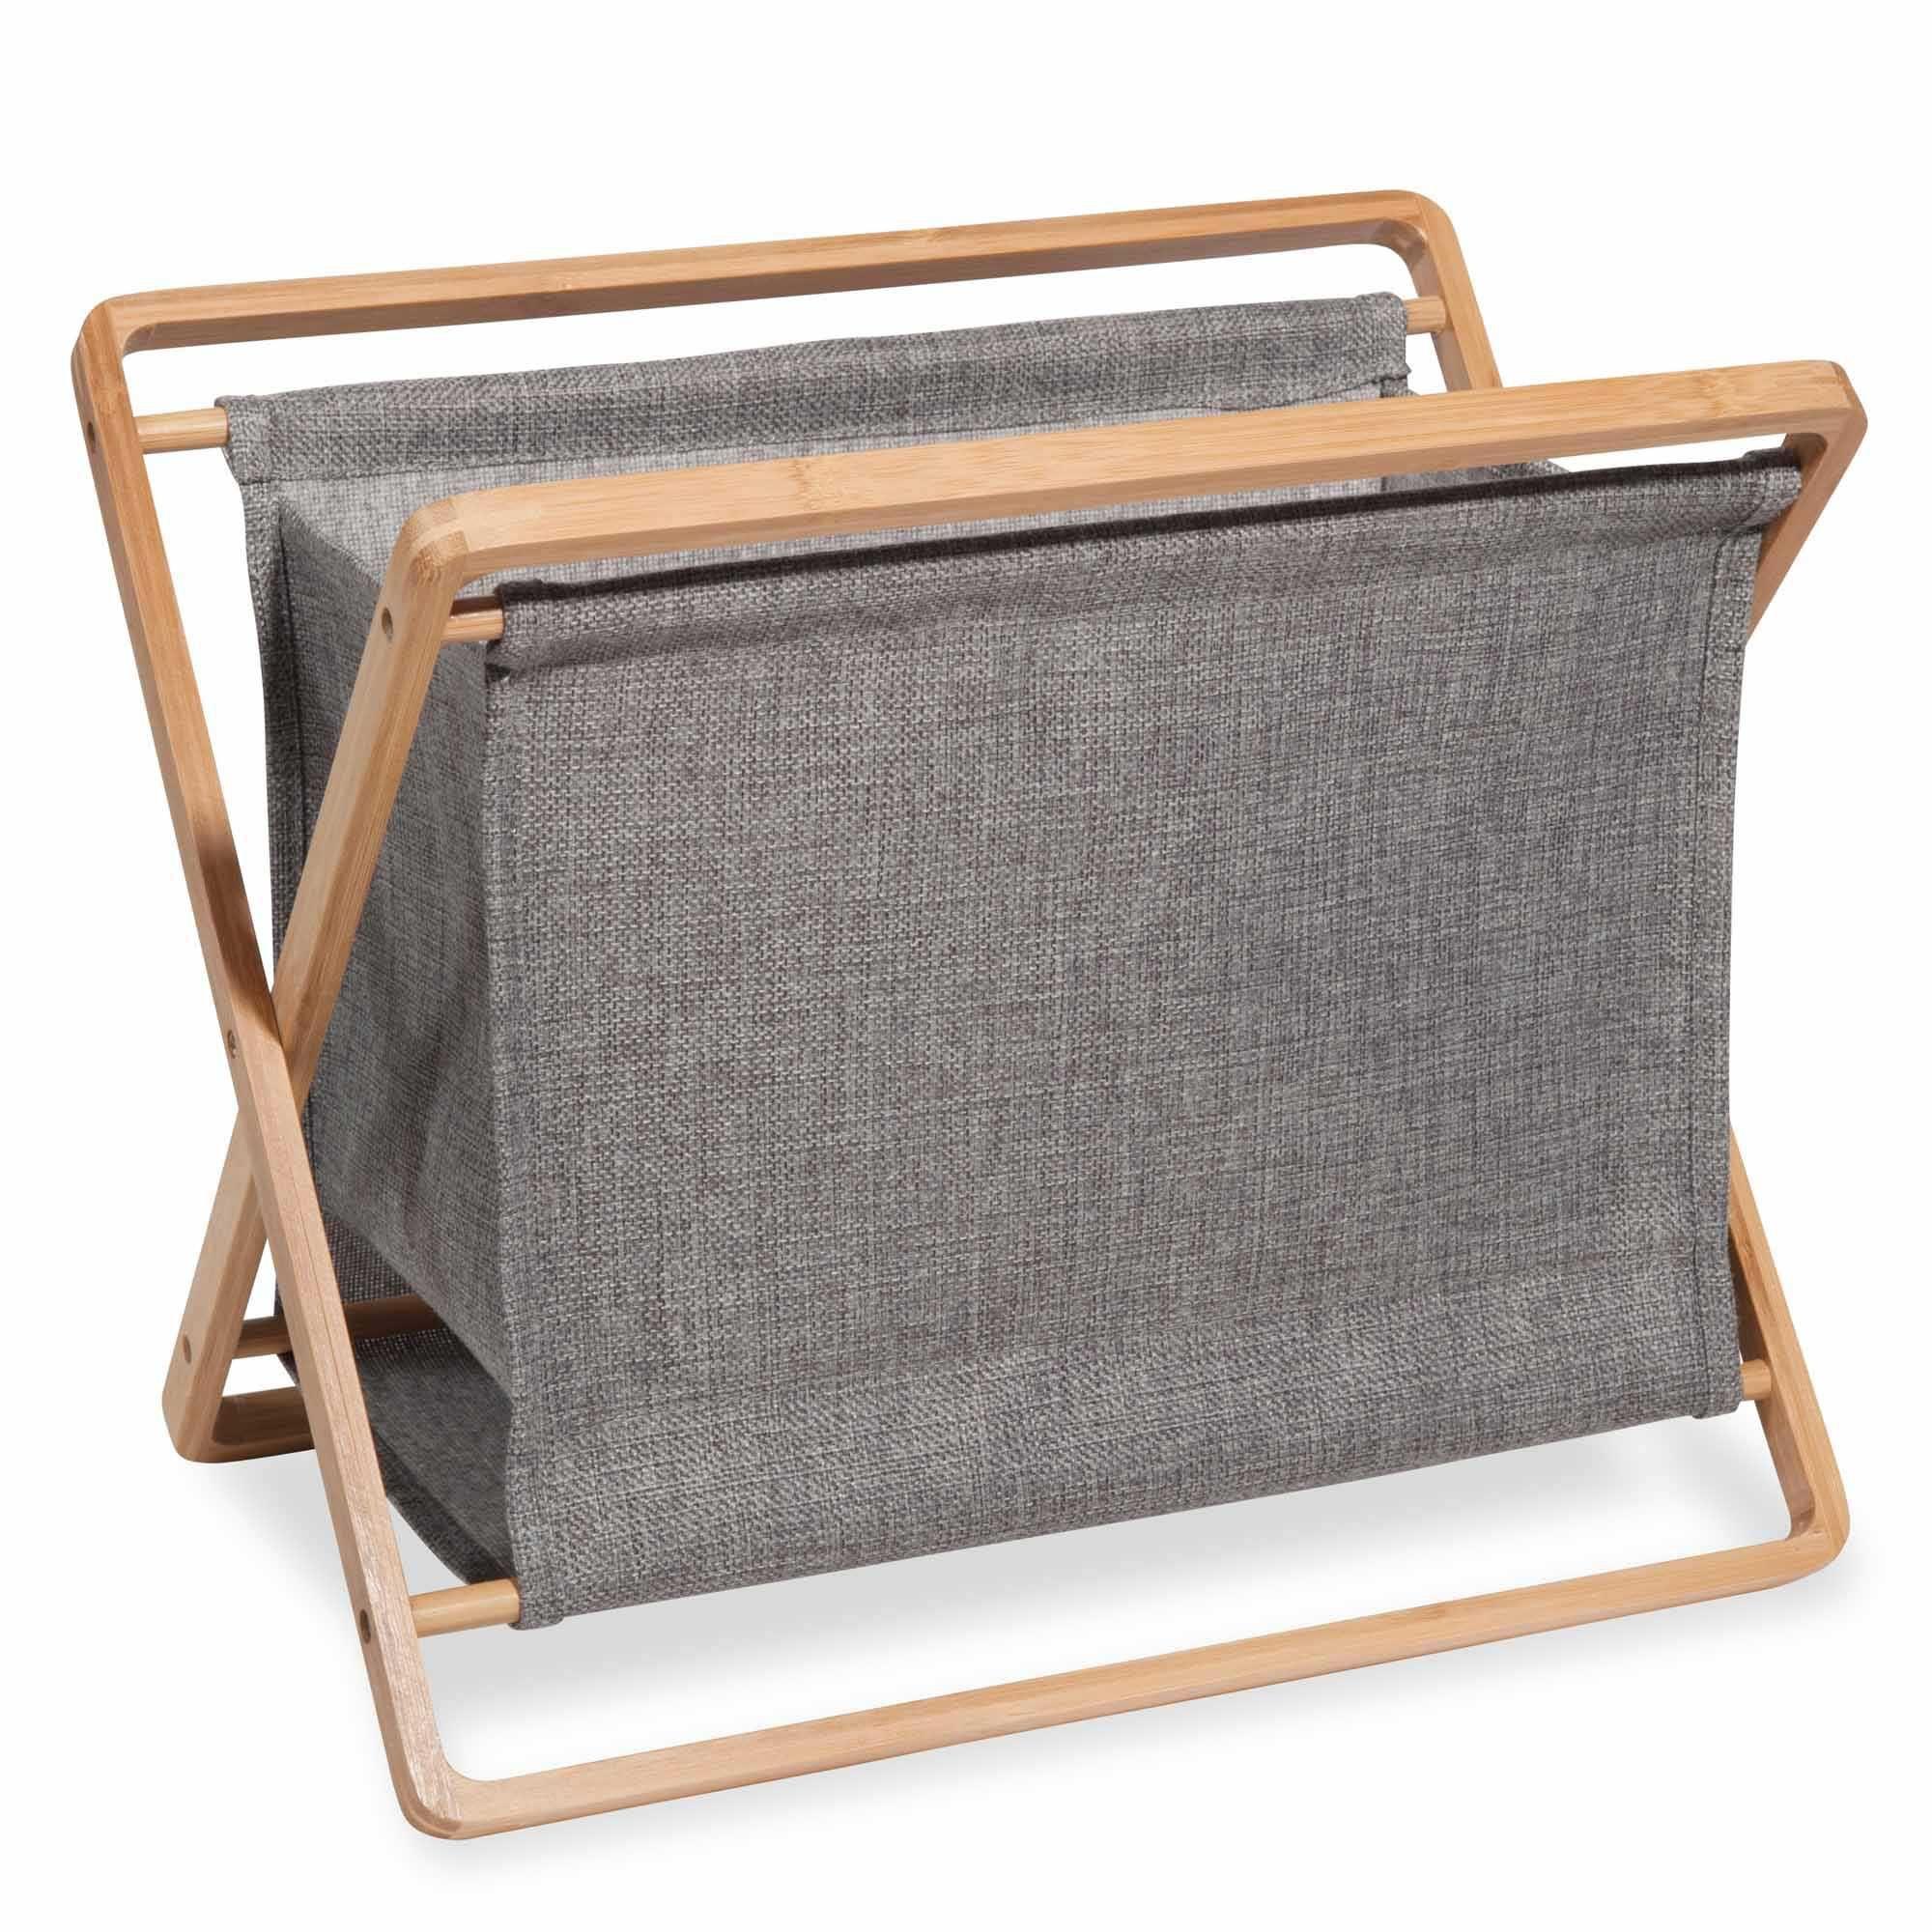 Porte Revues En Bambou Et Tissu Gris Alejandro Magazine Holders Grey Fabric Bamboo